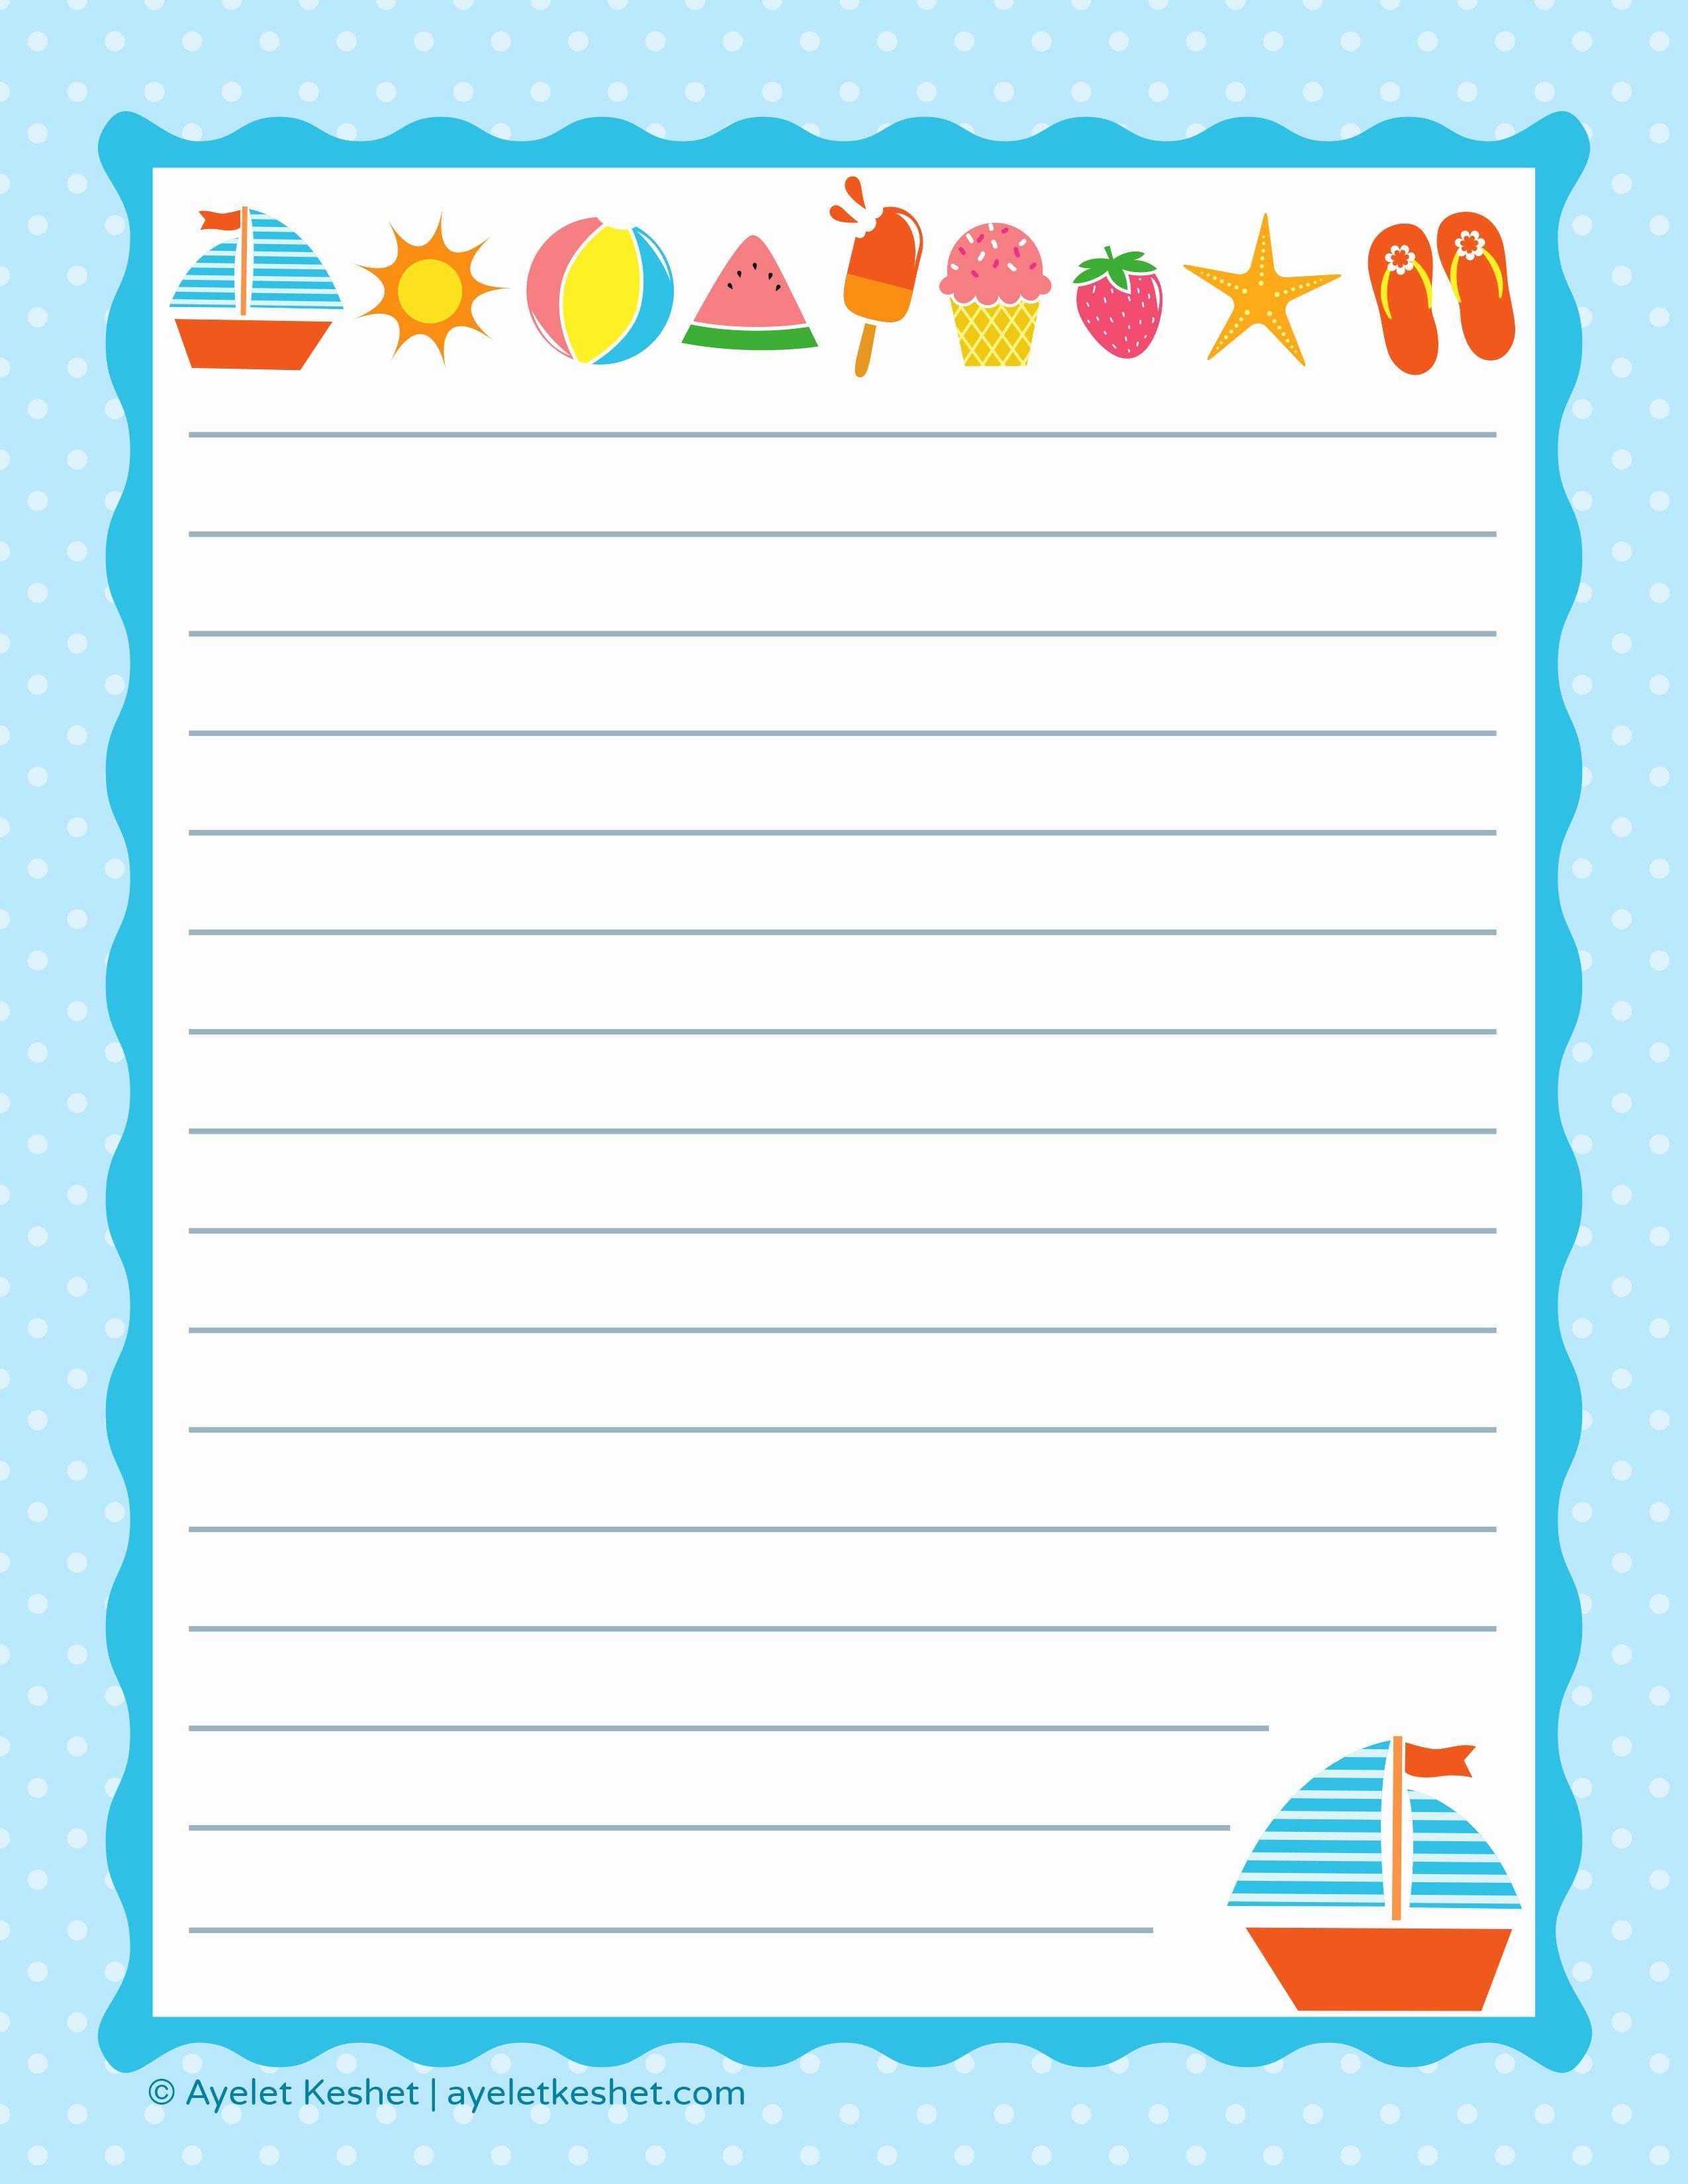 Free Printable Lined Paper Best Of Free Printable Letter Paper Ayelet Keshet